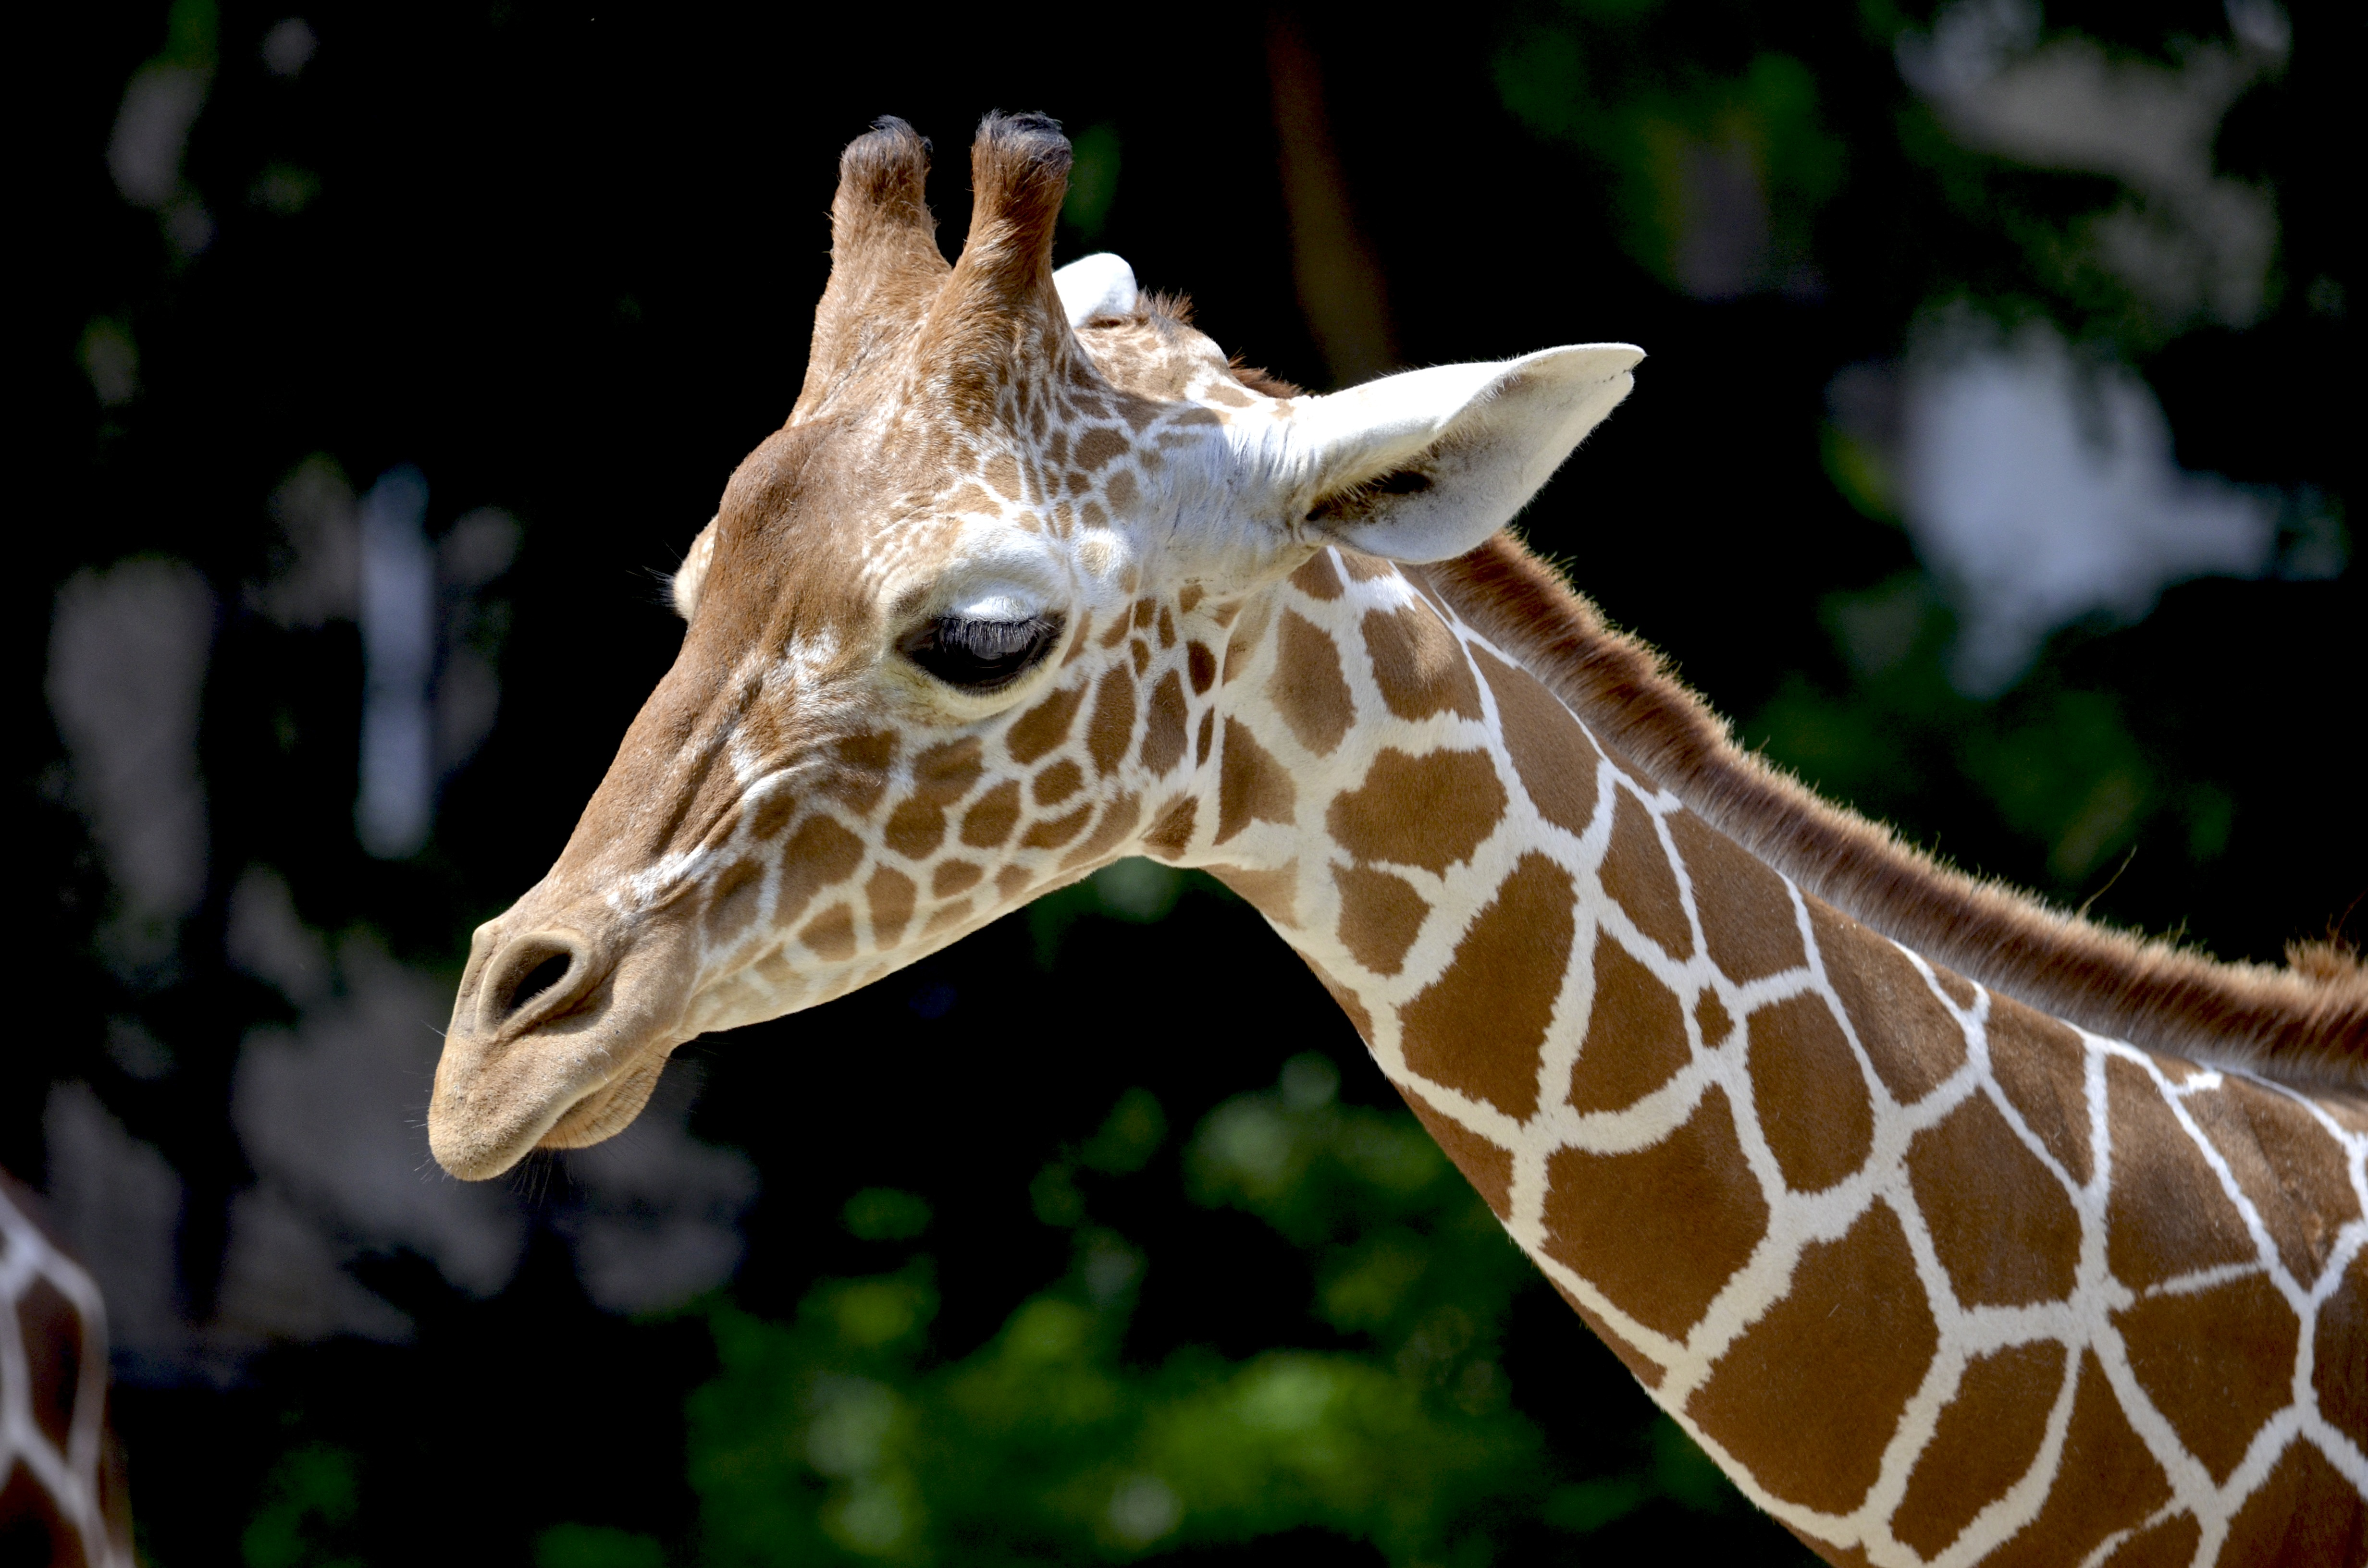 Beautiful Wild Animals Wallpapers Brown Giraffe During Daytime 183 Free Stock Photo